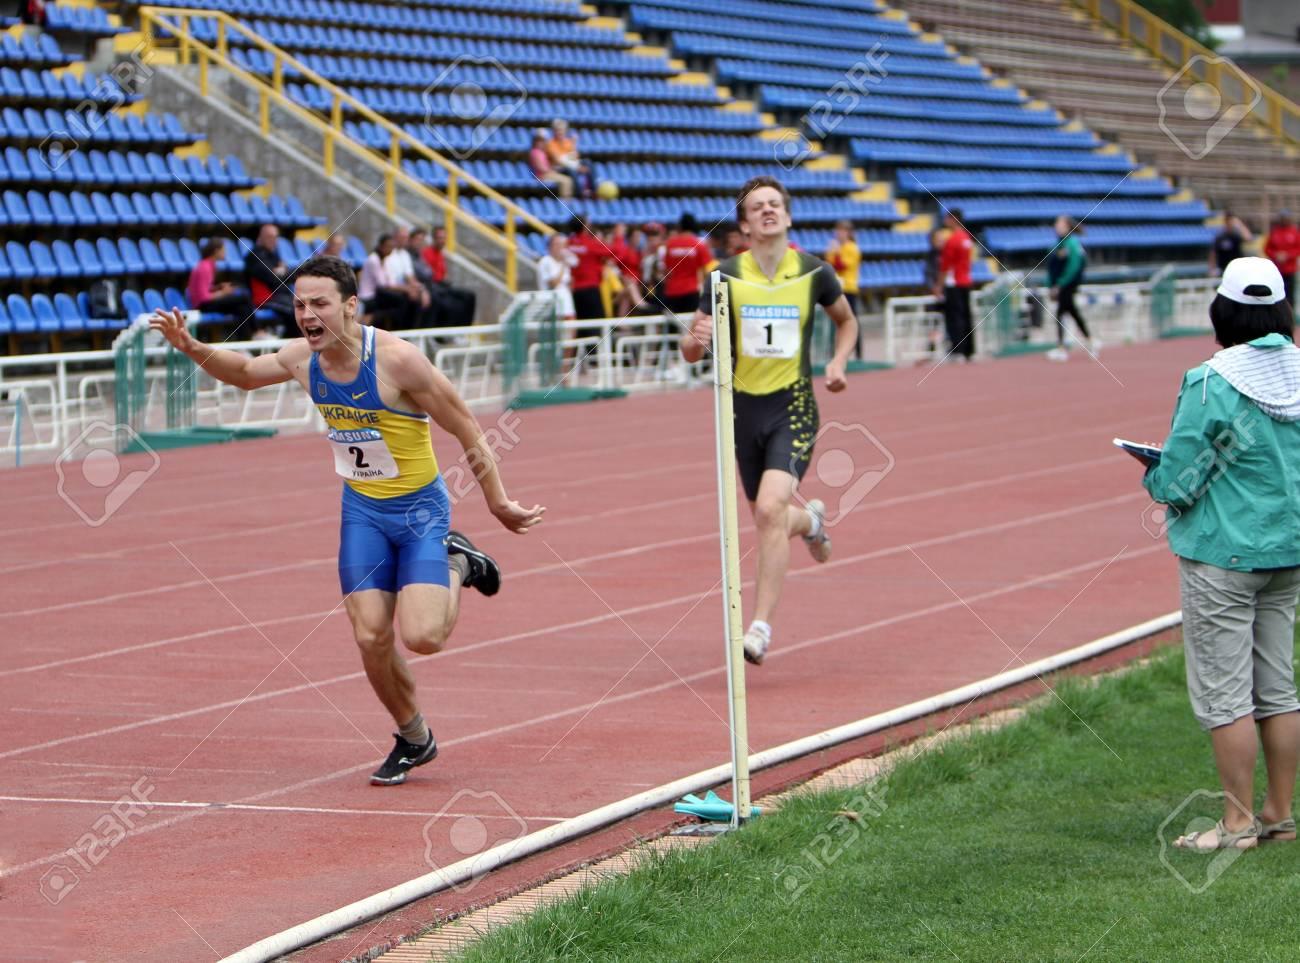 Yalta, Ukraine - May 25  athletes on the international athletic meet between UKRAINE, TURKEY and BELARUS on May 25, 2012 in Yalta, Ukraine  Stock Photo - 13796026